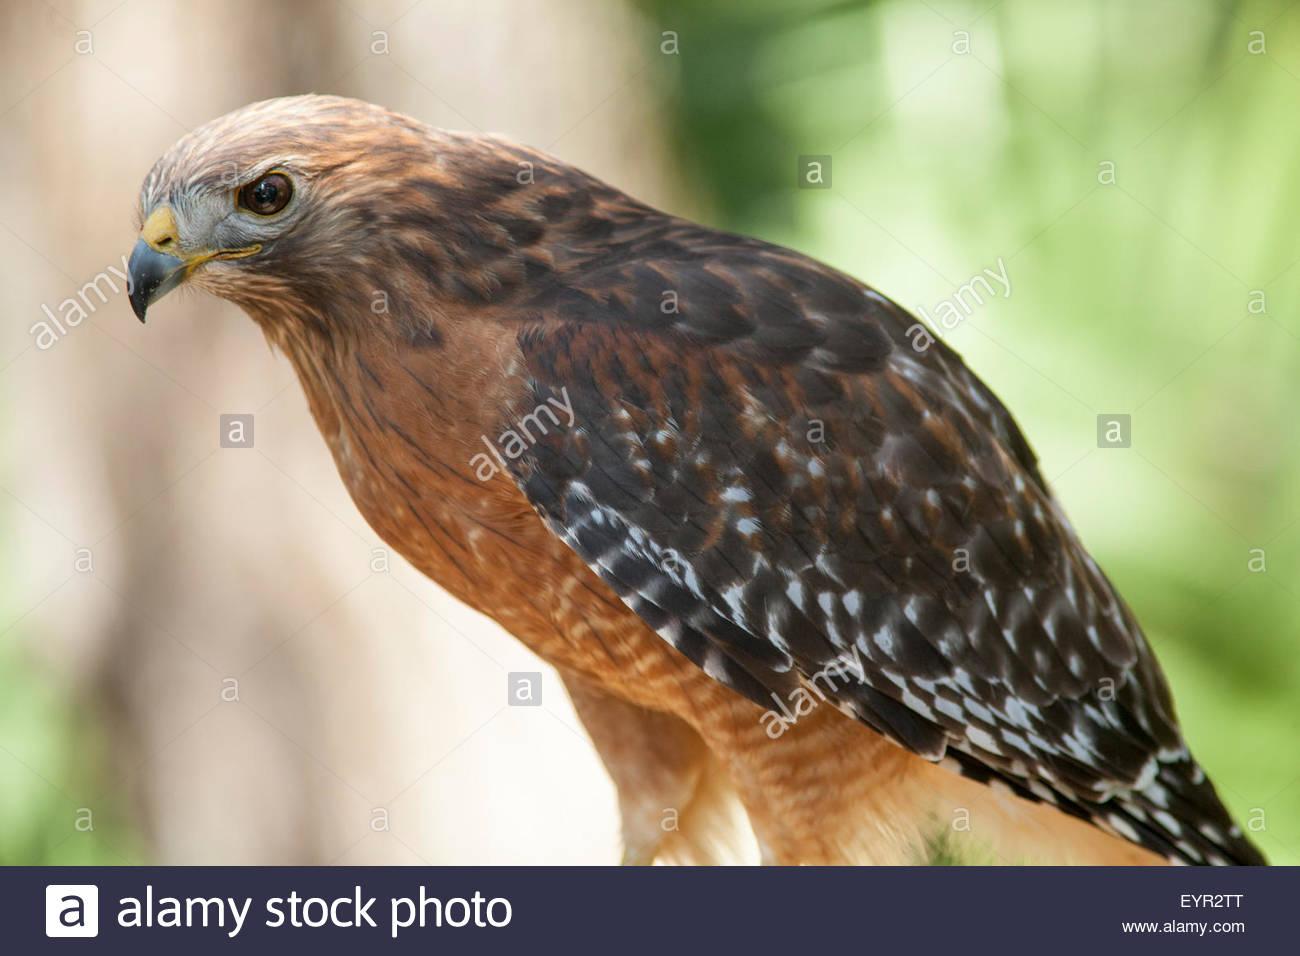 Red-shouldered Hawk, Brevard Zoo, Florida - Stock Image